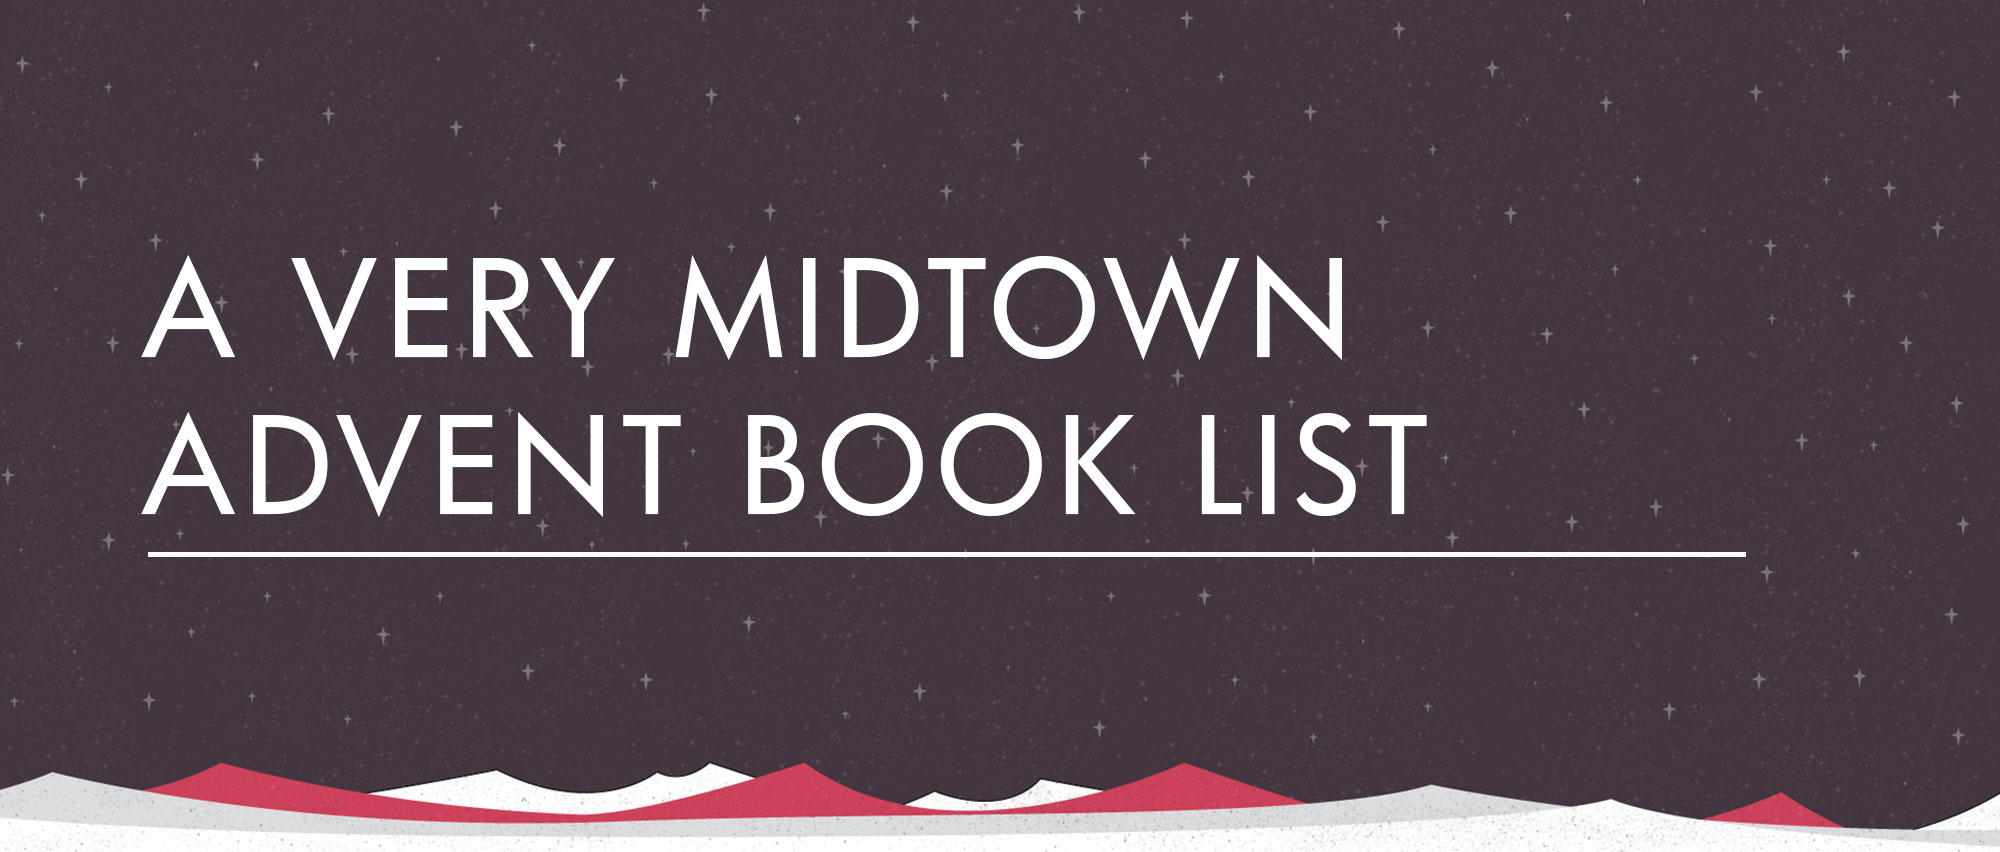 Giv_BlogHeader_A-Very-Midtown-Advent-Book-List.jpg